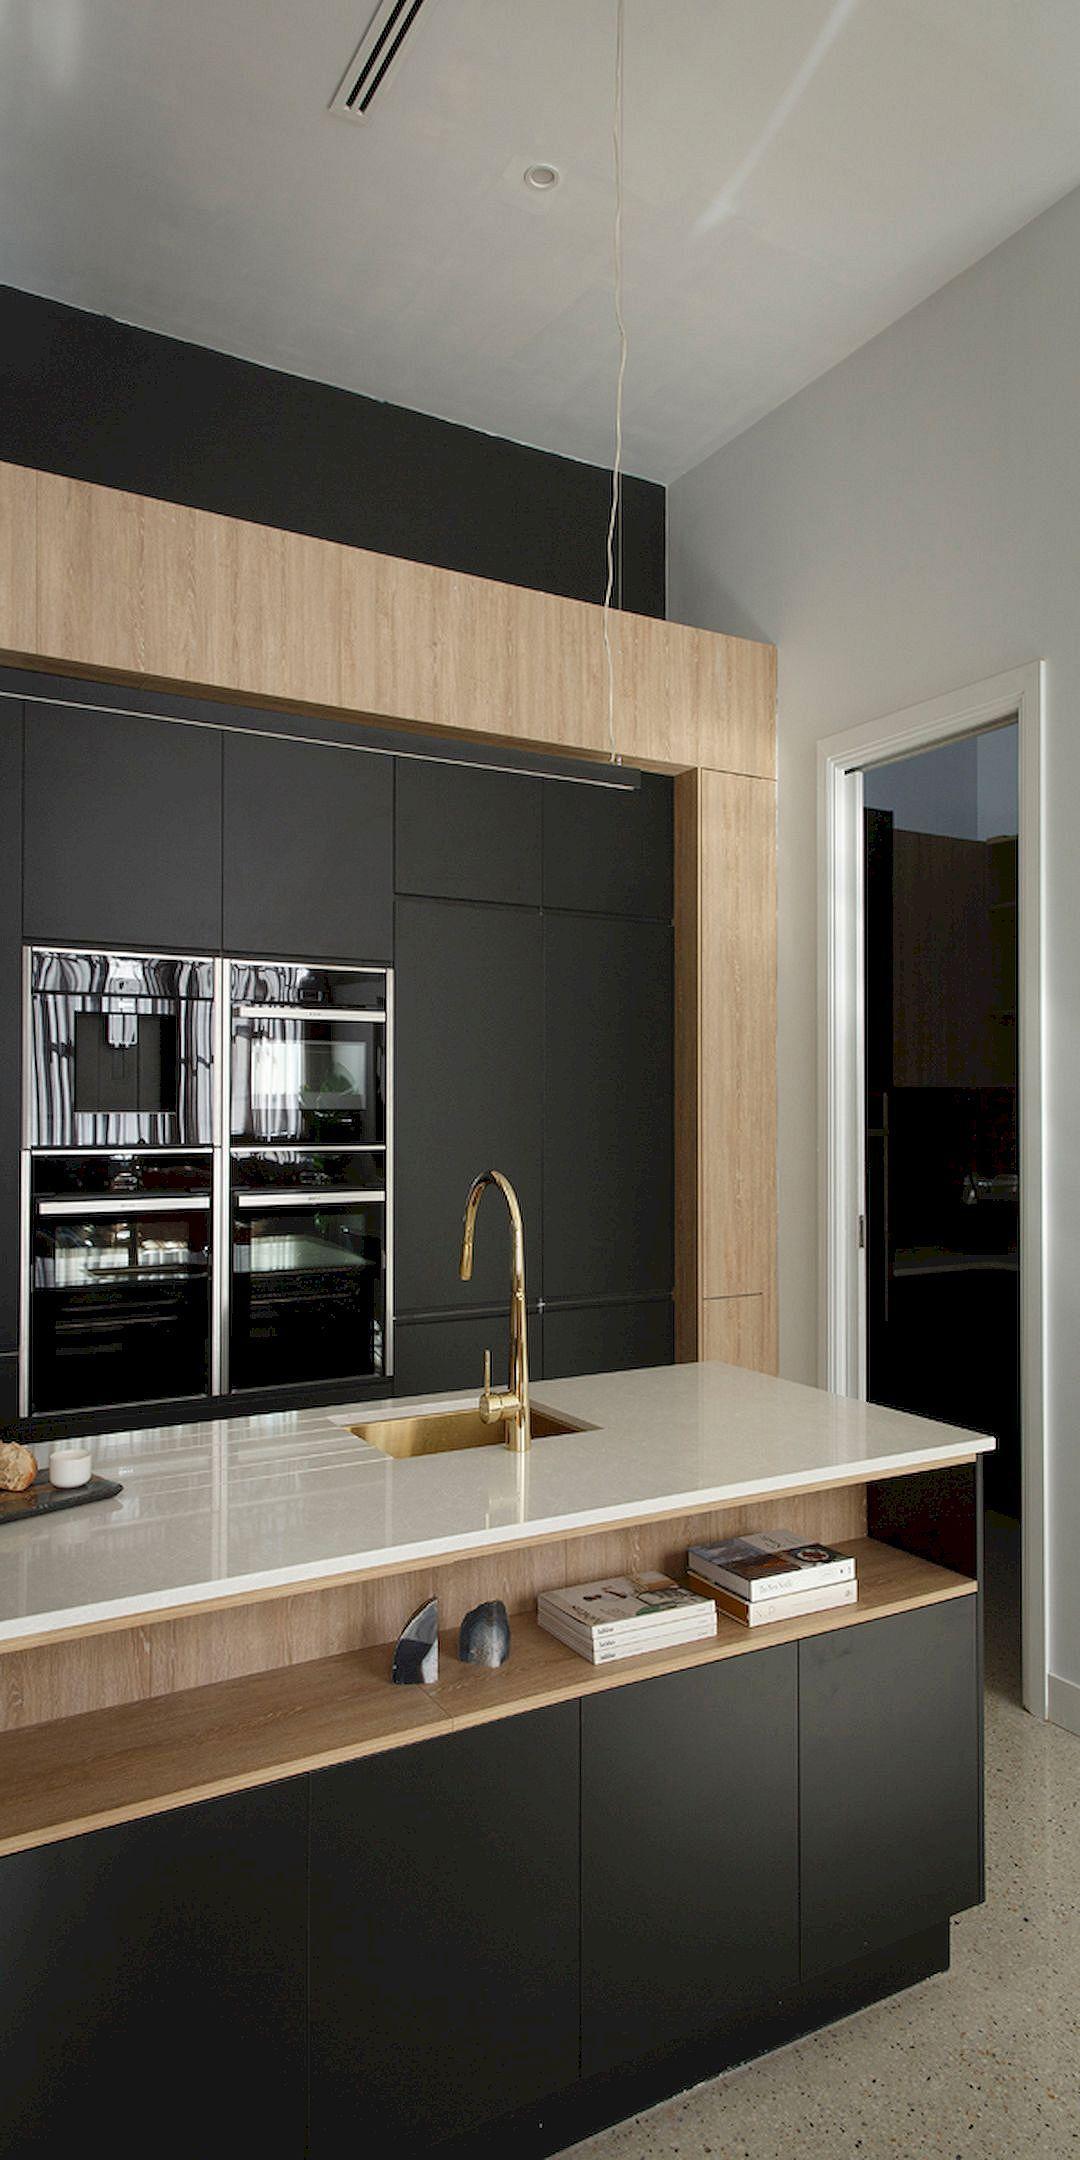 Perfectly Designed Modern Kitchen Inspiration 129 12